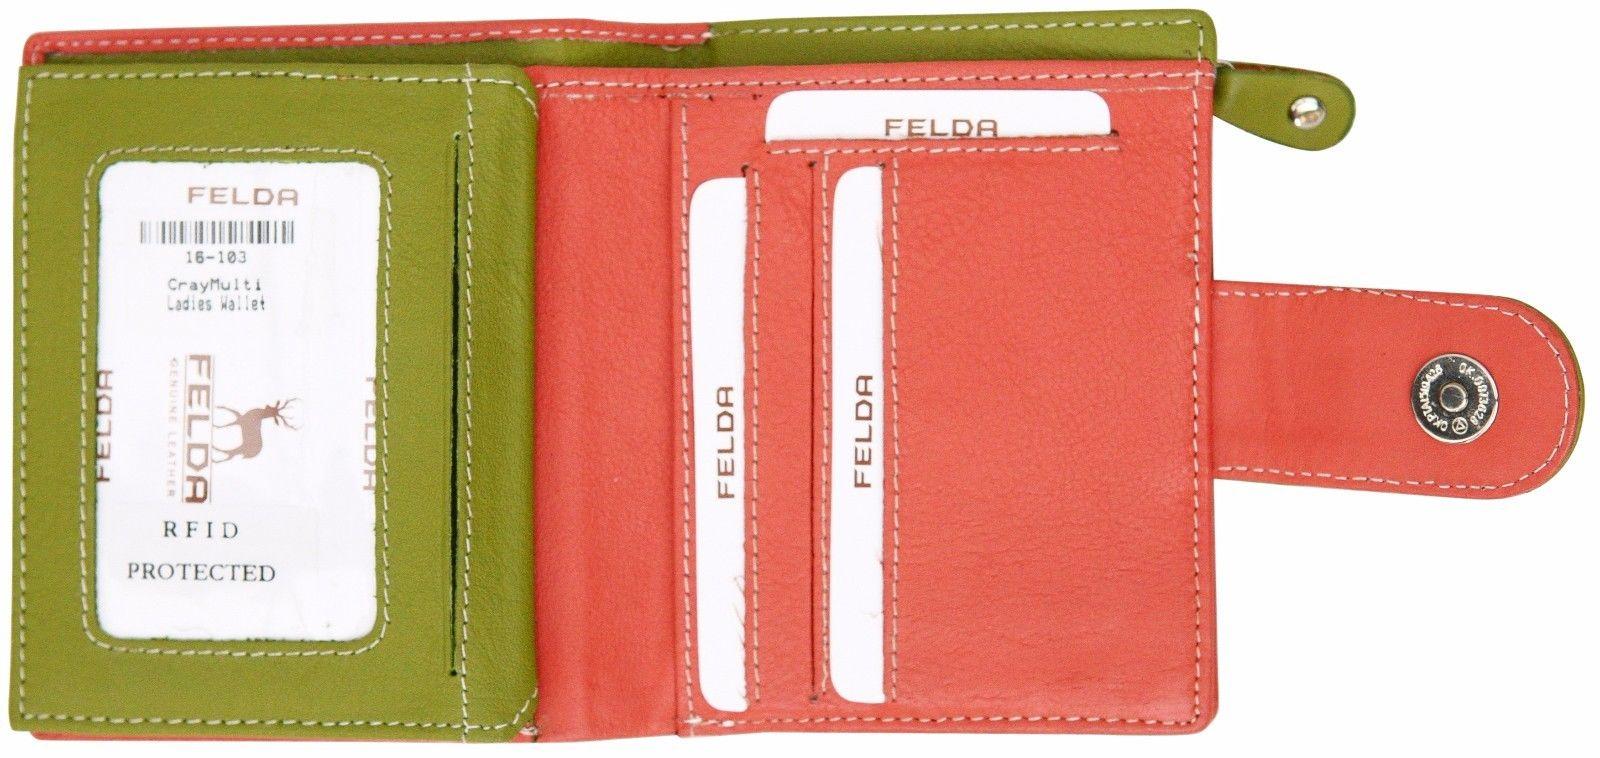 Felda-RFID-onorevoli-MEDAGLIA-amp-Card-Purse-Wallet-Genuine-Leather-Multi-SOFT-BOX-REGALO miniatura 27